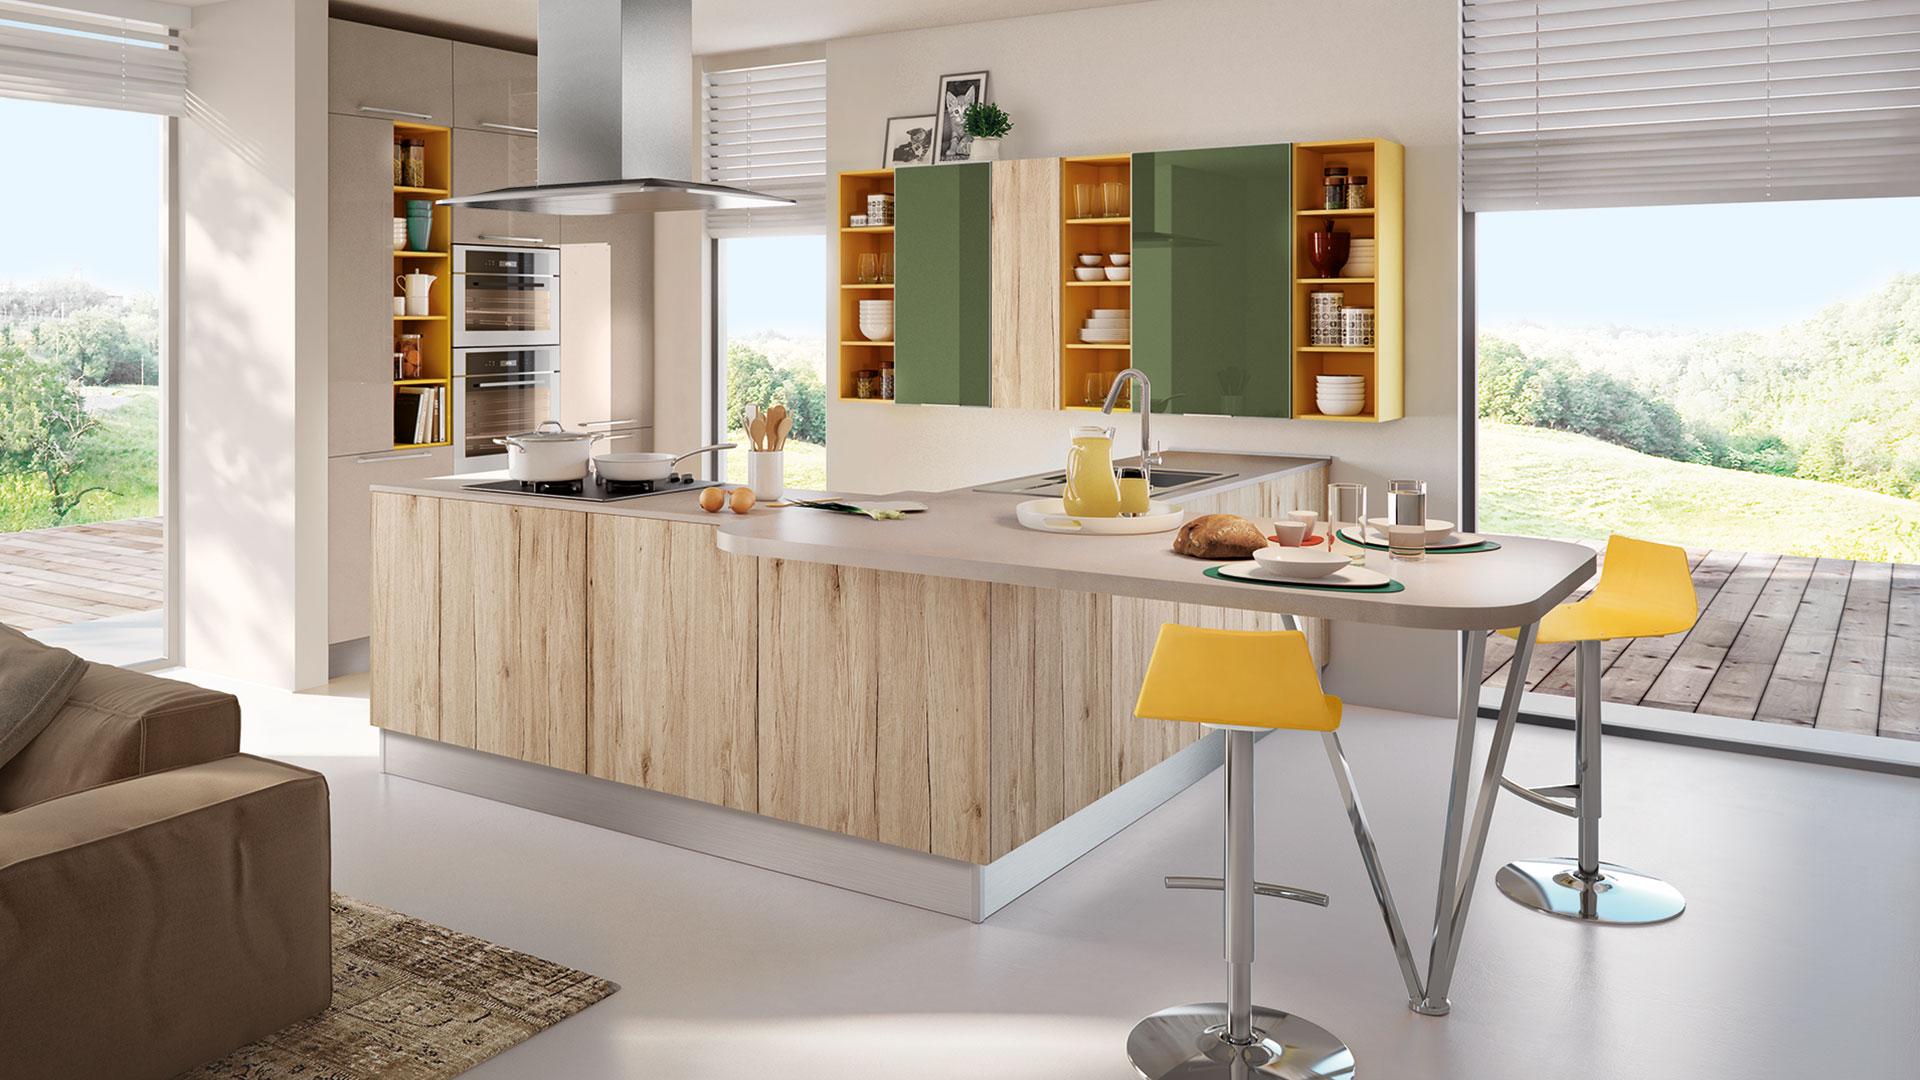 Ricambi Cucine Lube Napoli swing - cucine moderne - cucine lube